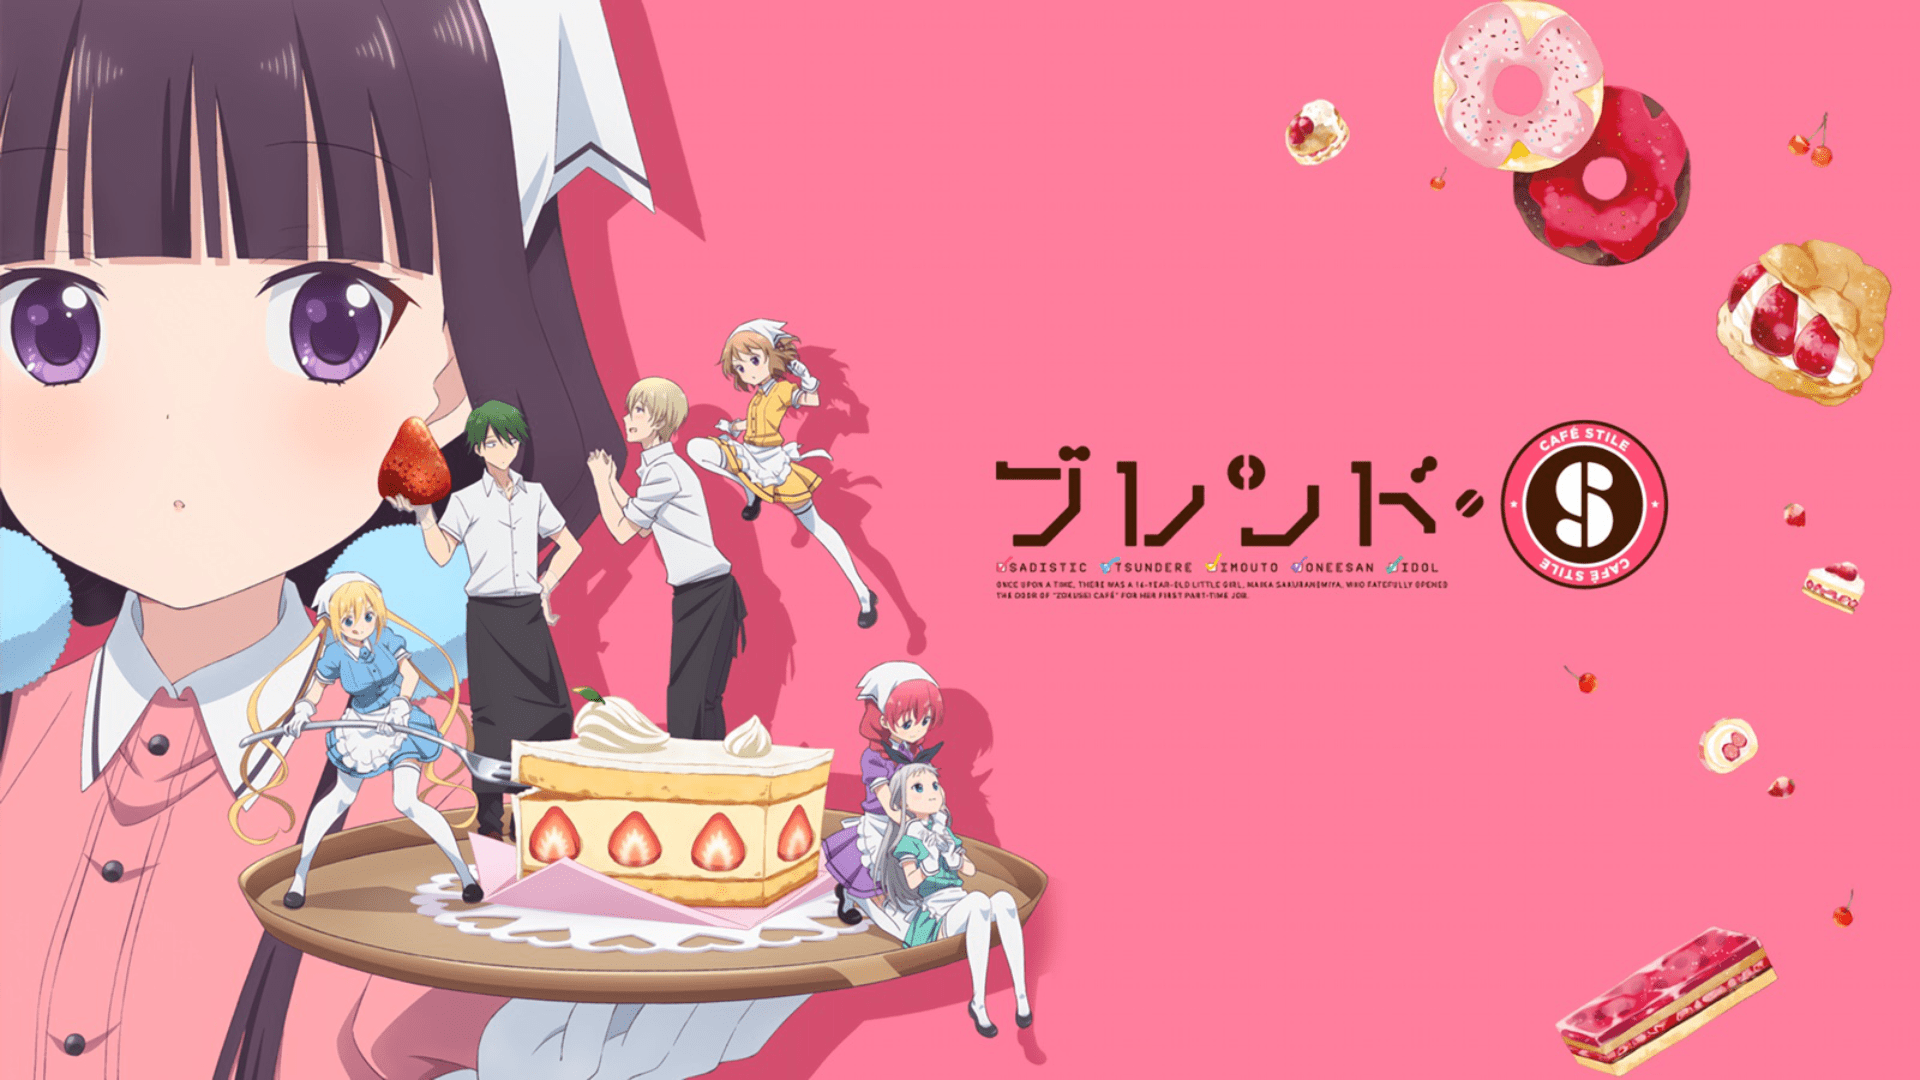 Cafe comedy and romance anime similar to Inu X Boku SS, BLEND S